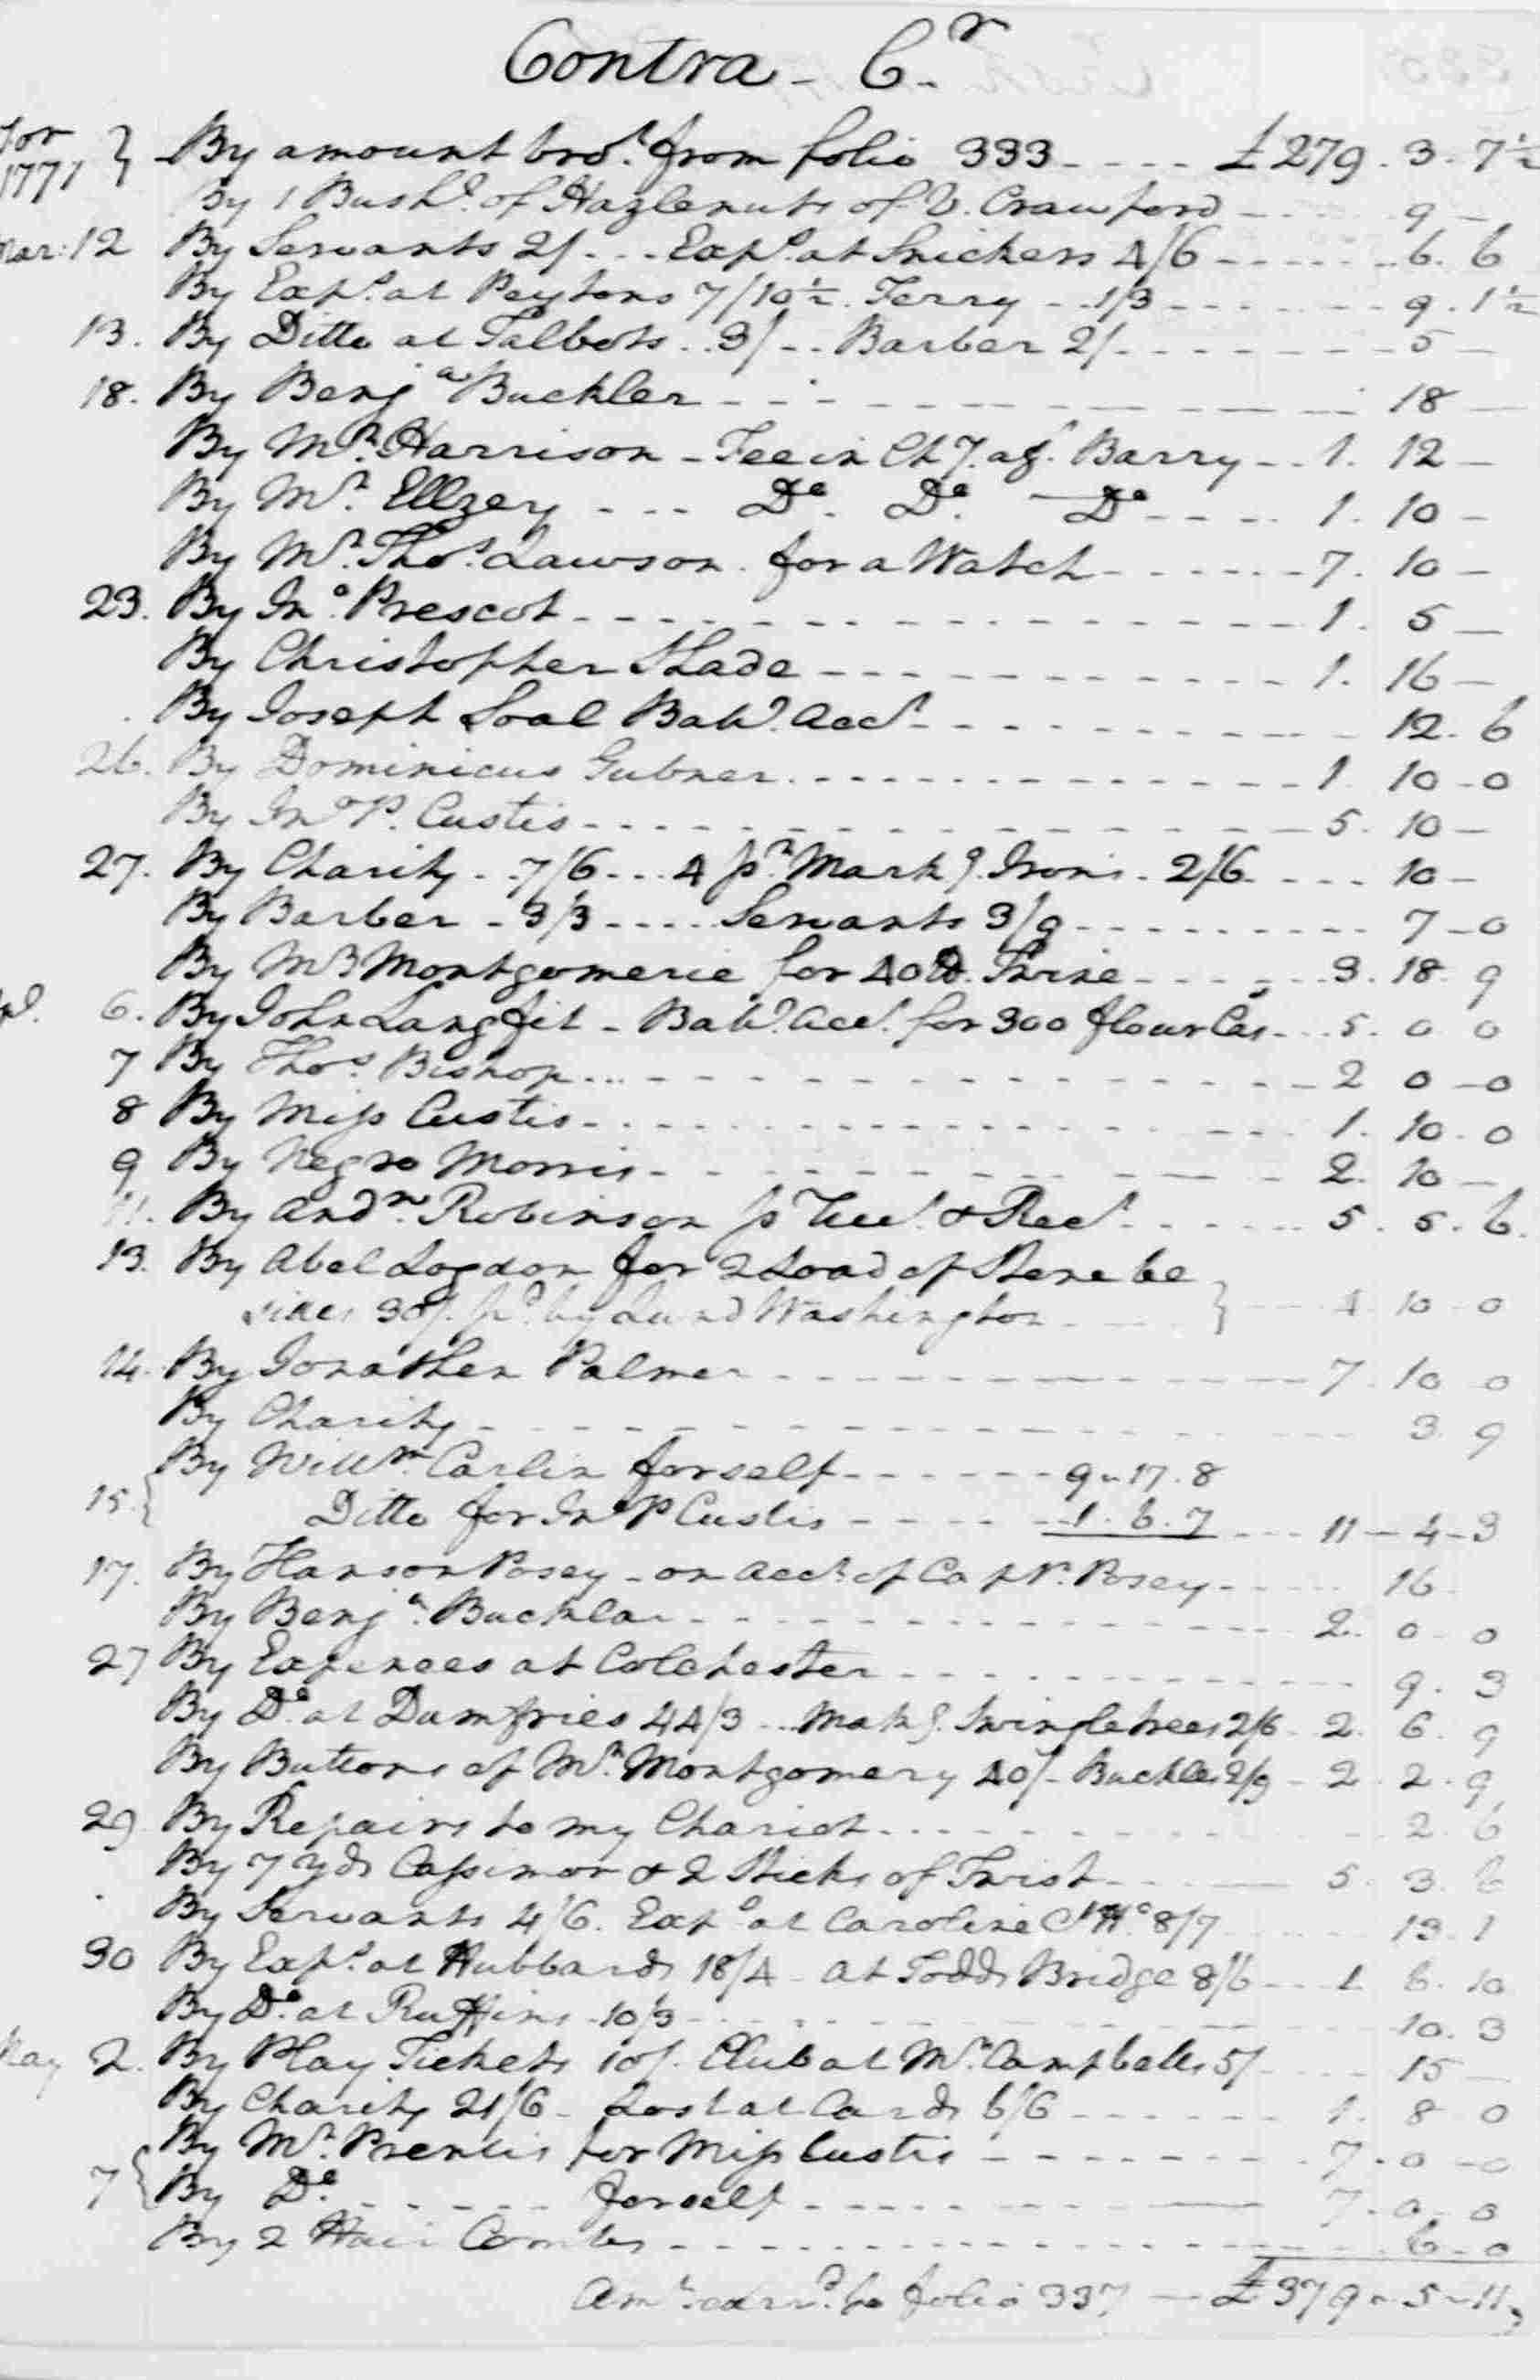 Ledger A, folio 335, right side